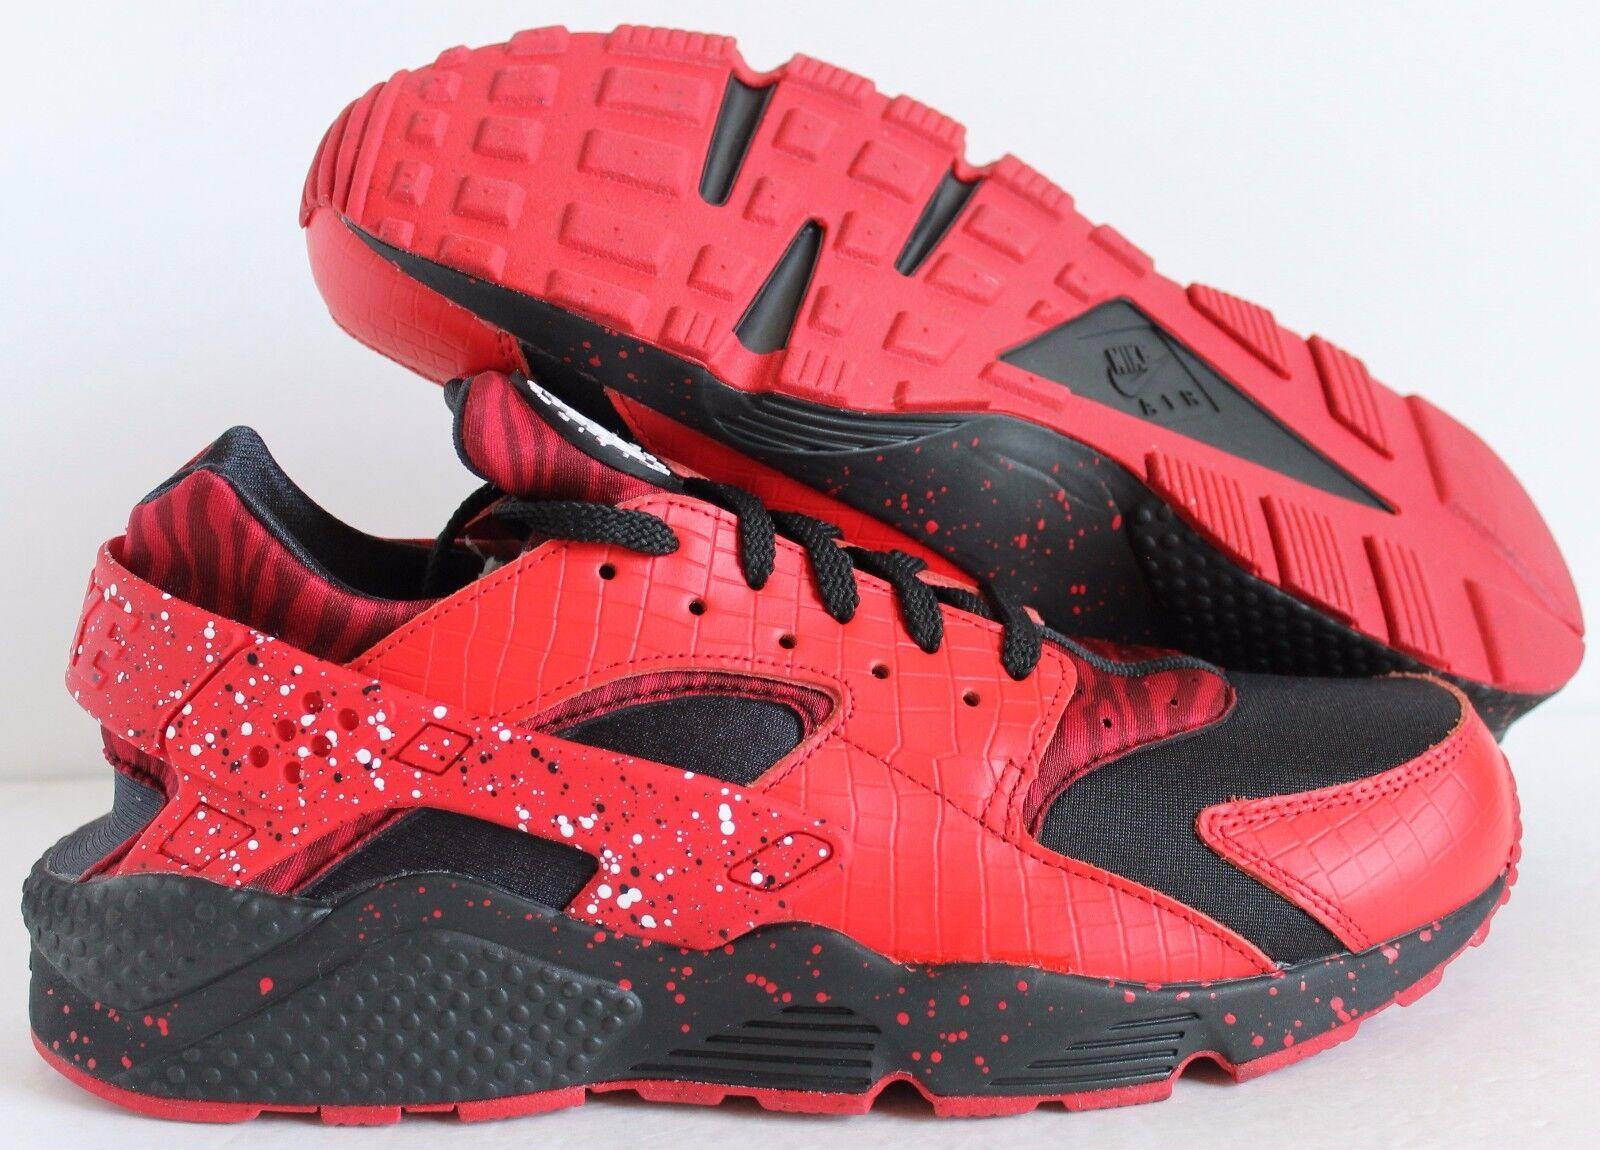 "timeless design 9b7c4 48af7 Nike Nike Nike Hombre Air Huarache Premium ID Rojonegro  777330997  a04ff9.  """